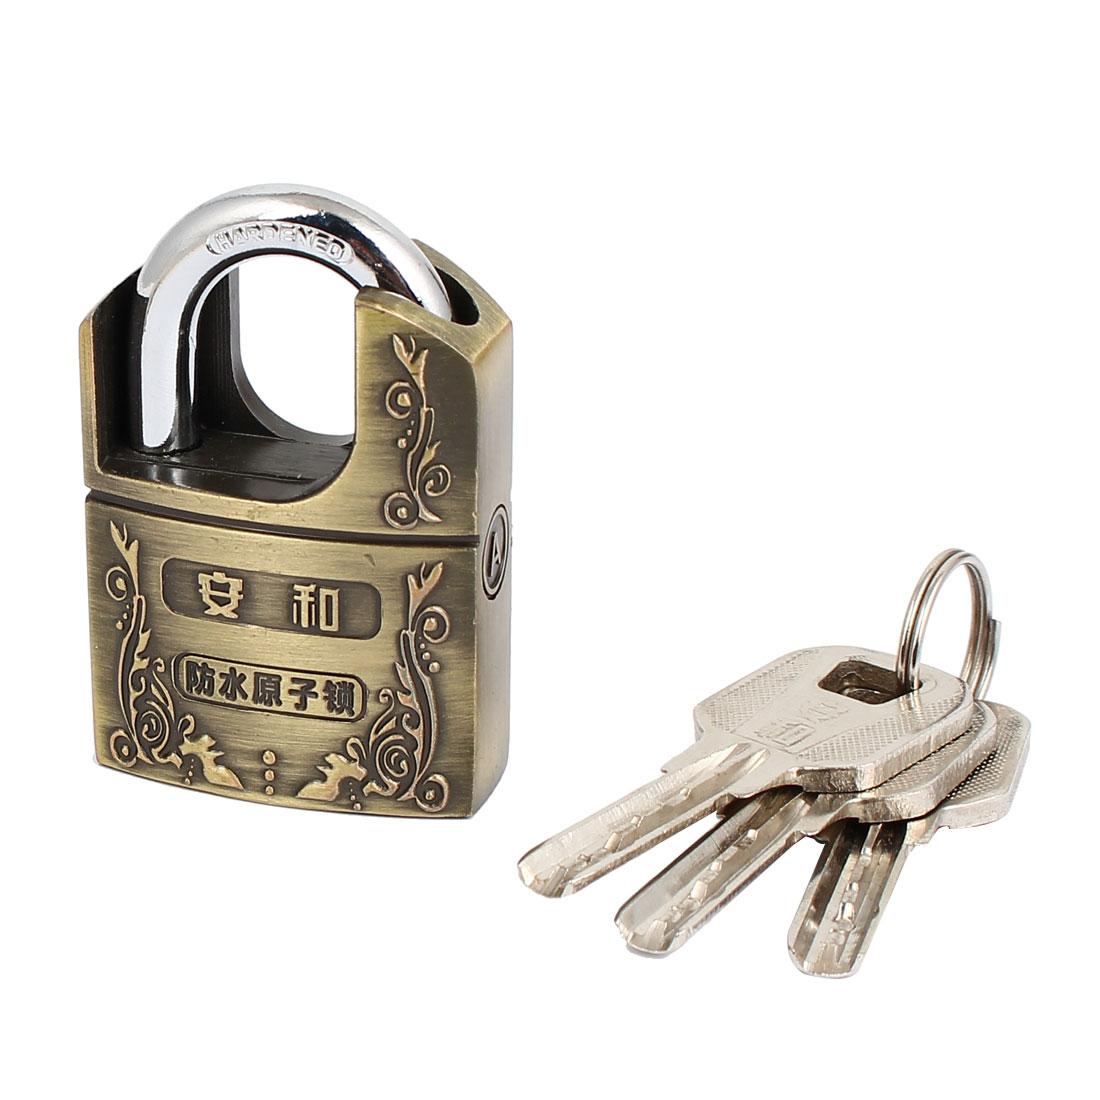 Dorm Garage Door Alloy Hardened Closed Shackle Security Padlock Lock 40mm Width w 3 Keys